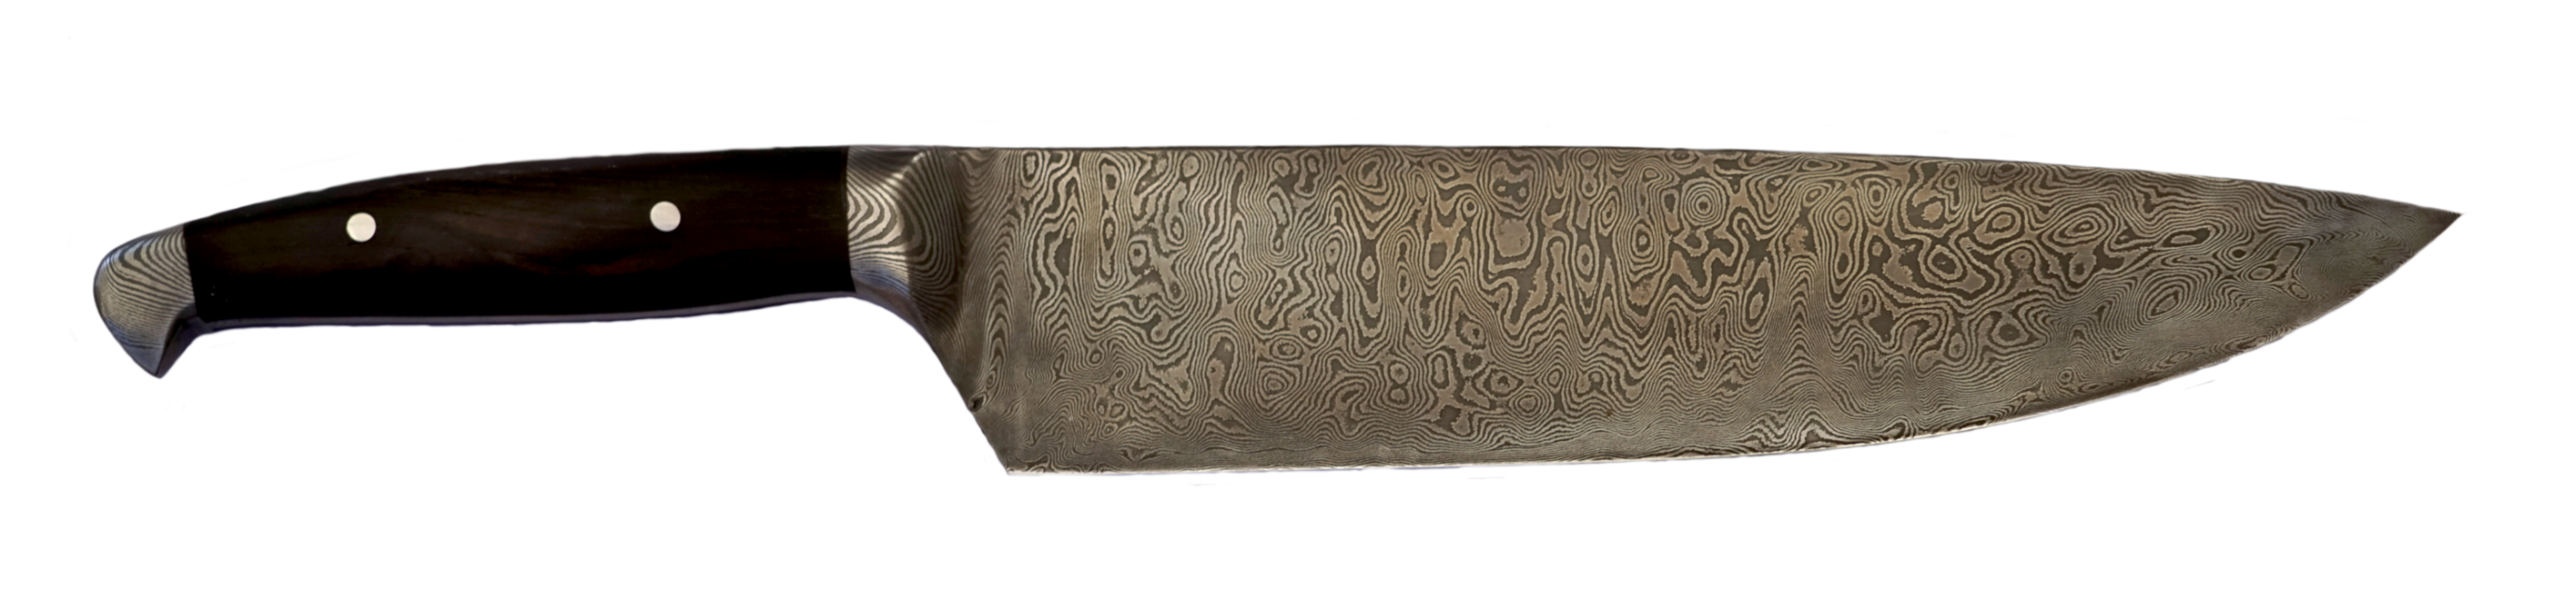 Damastkochmesser Vollintegral